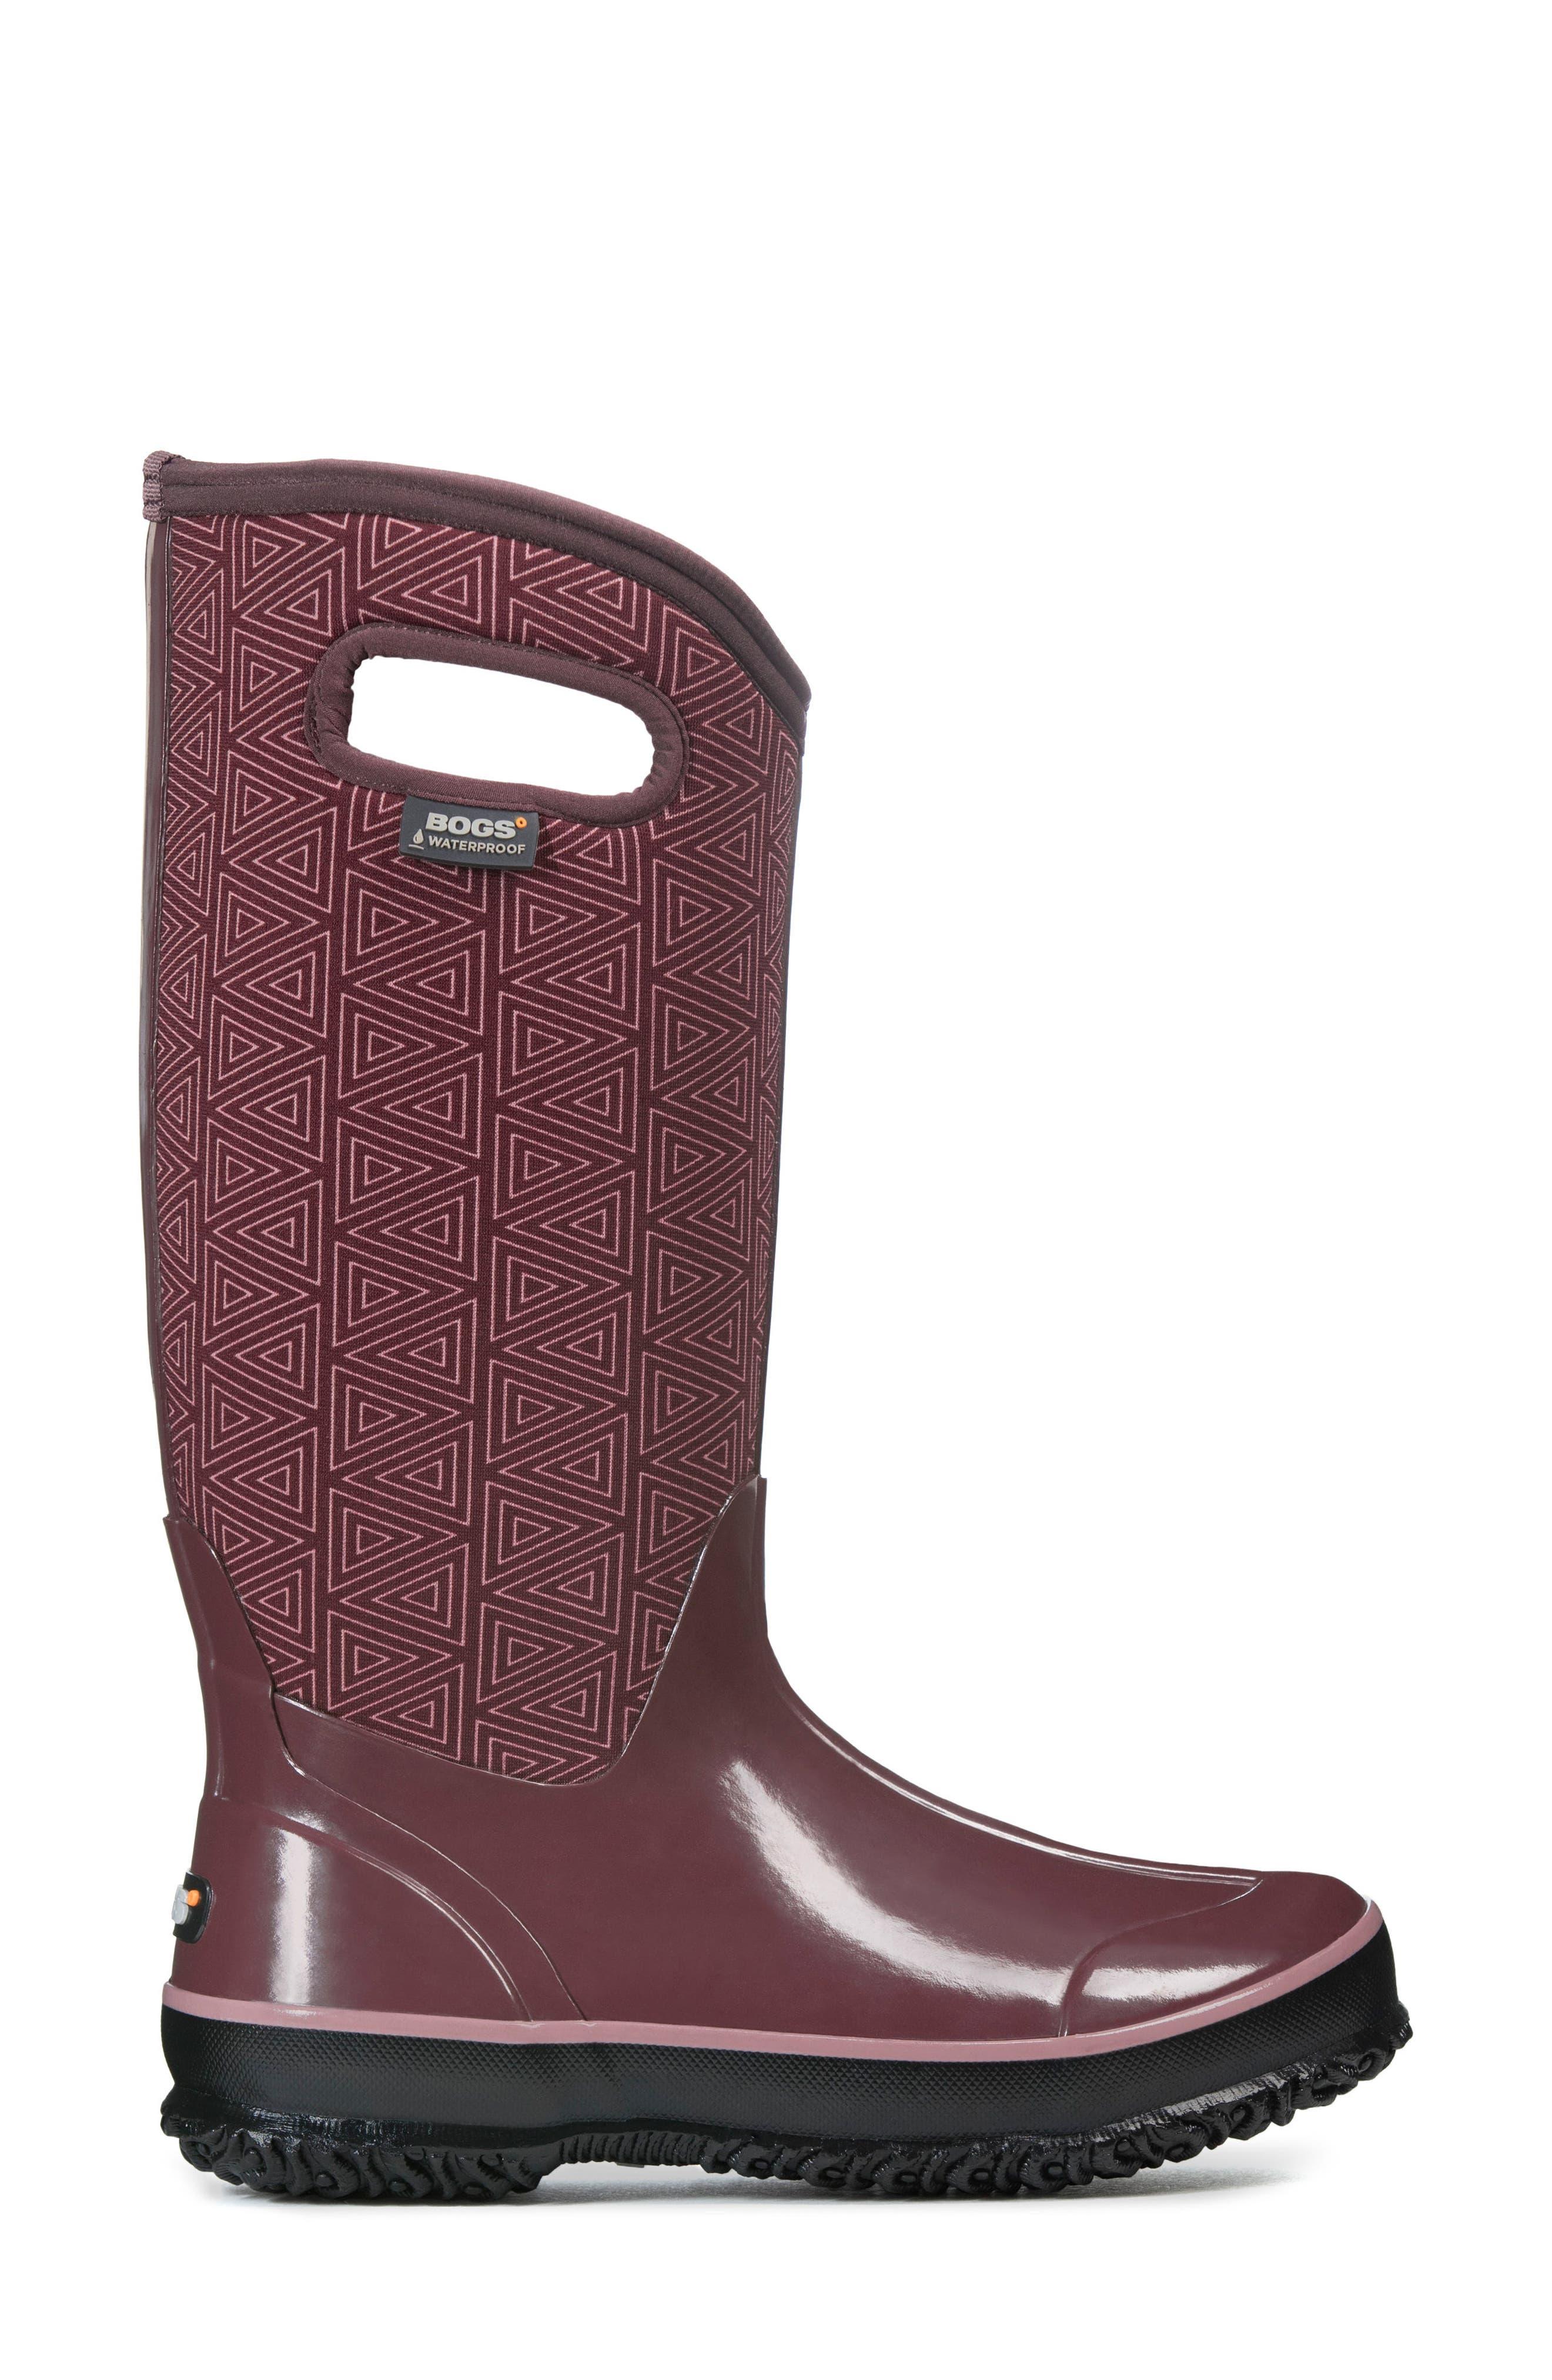 Alternate Image 3  - Bogs Classic Triangles Waterproof Subzero Insulated Boot (Women)